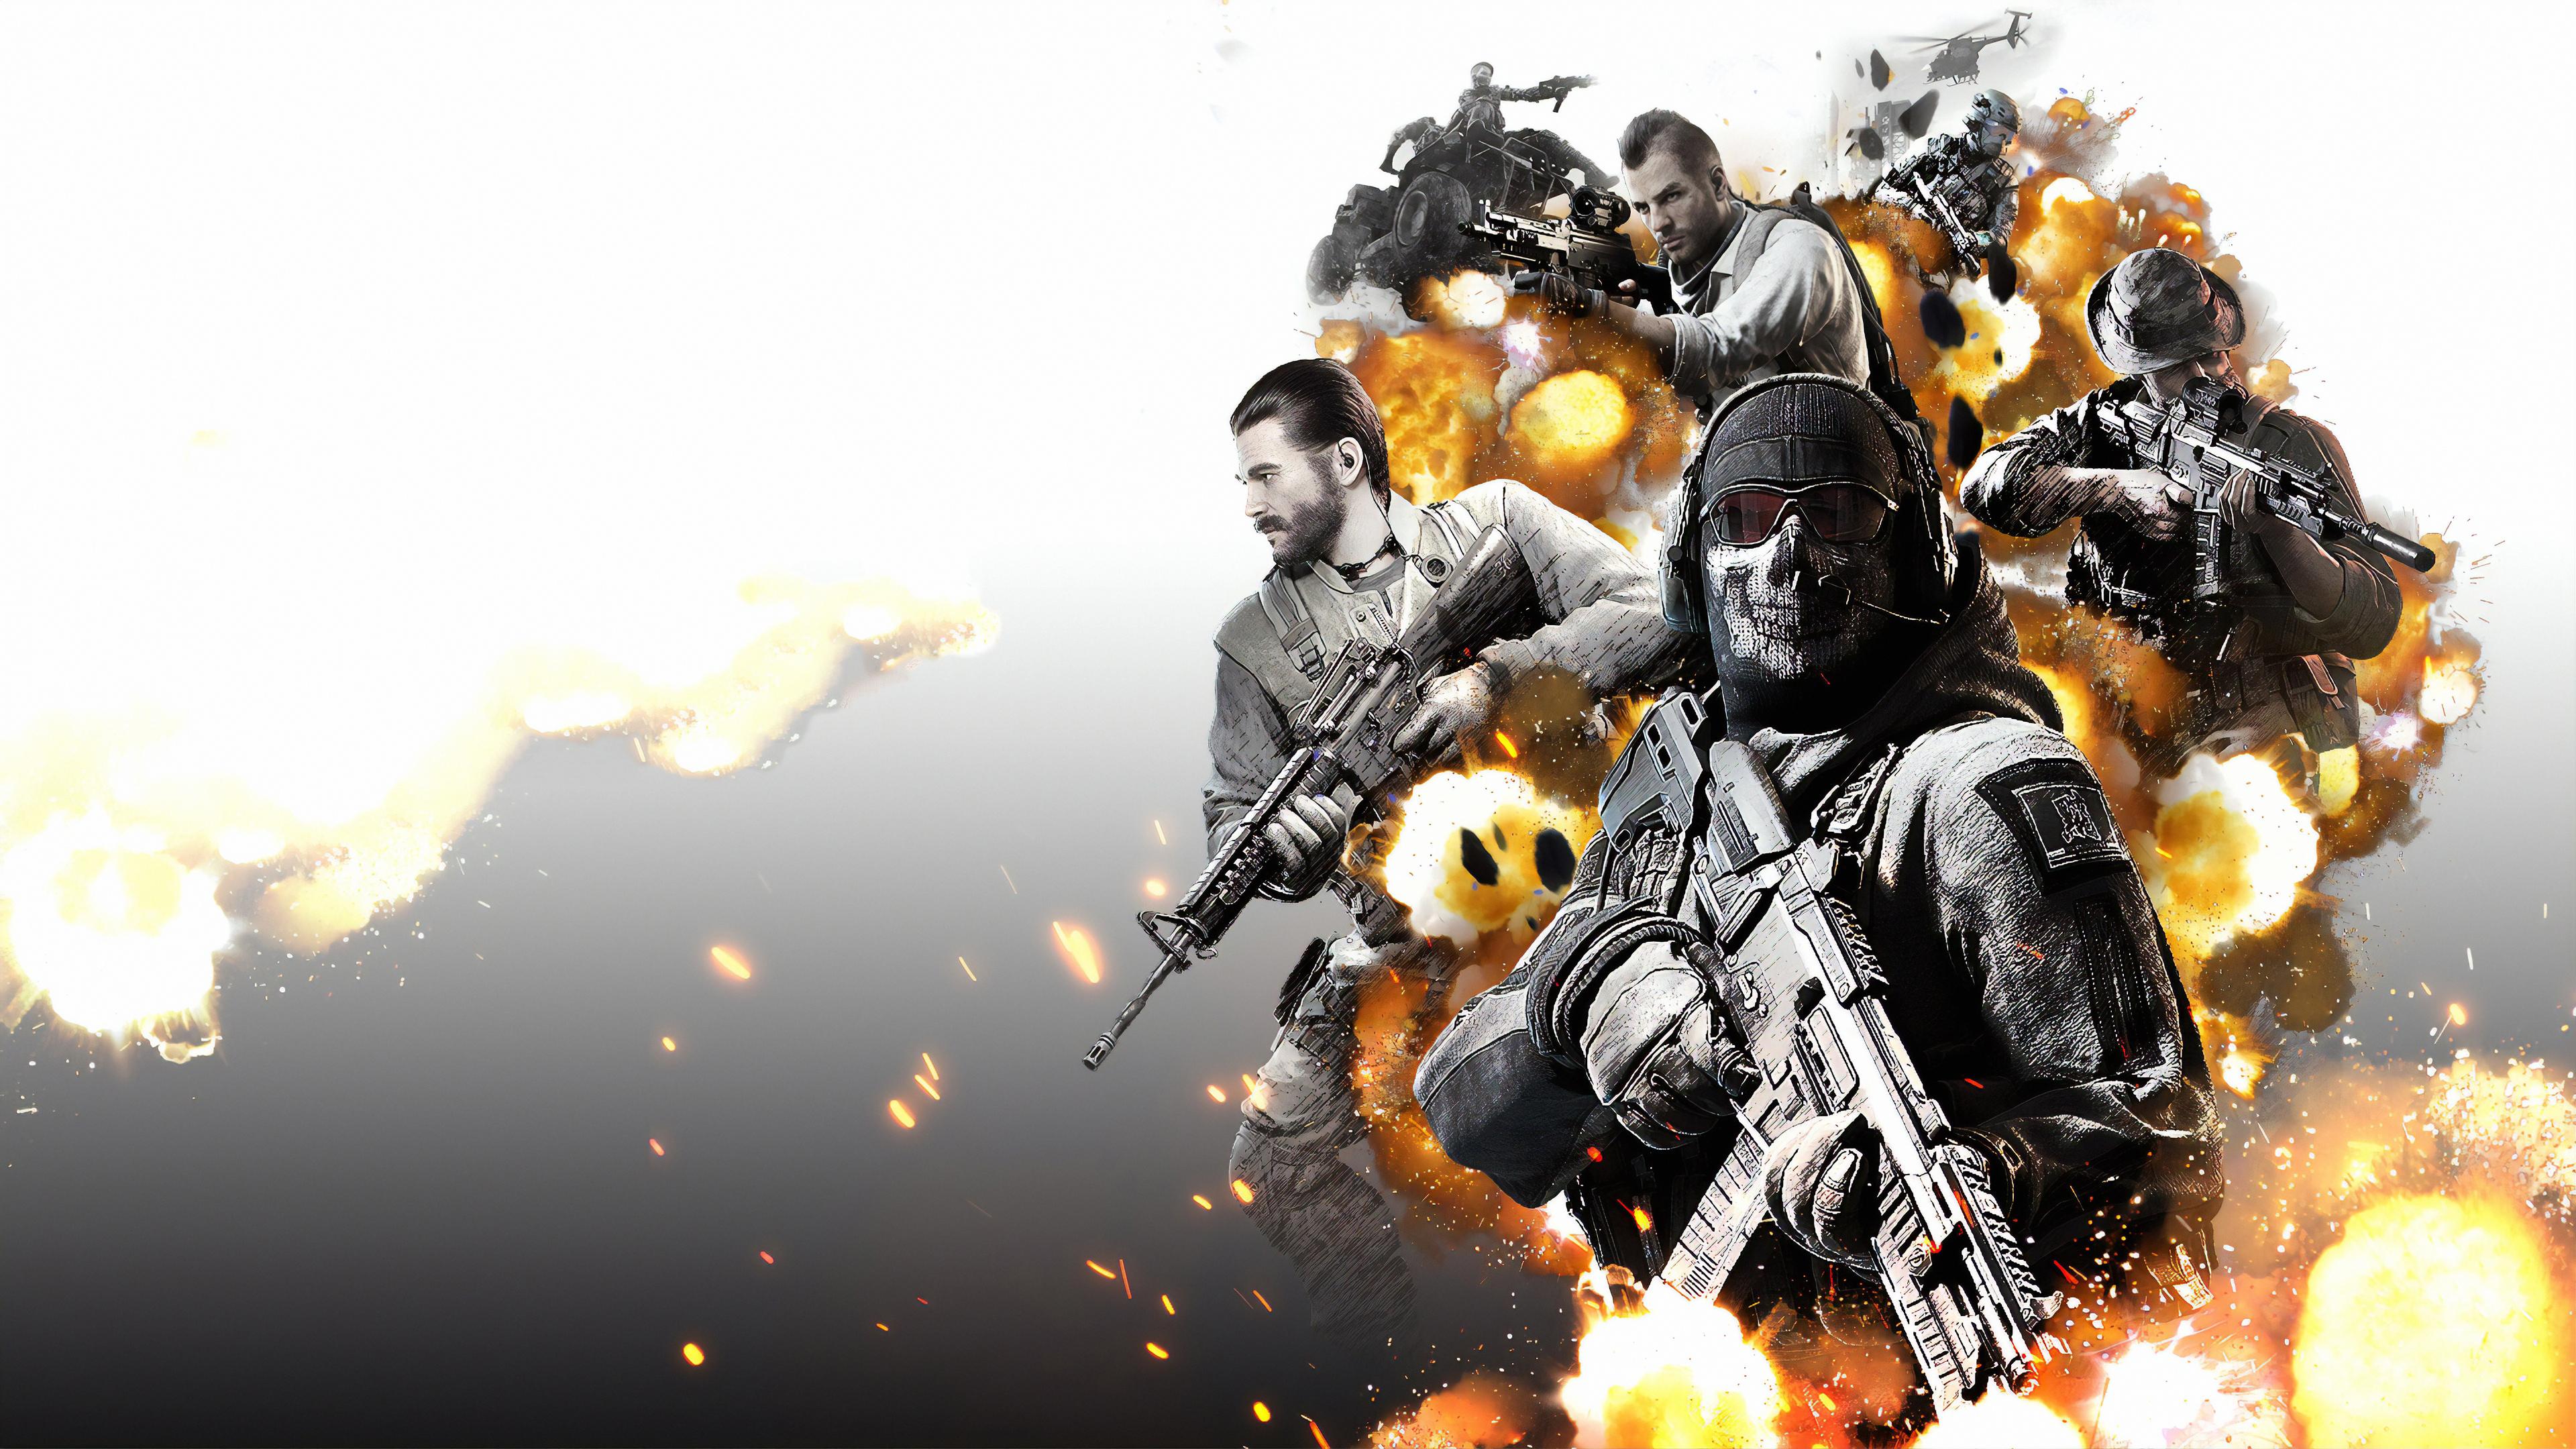 call of duty mobile 1572369533 - Call Of Duty Mobile - mobile wallpapers, hd-wallpapers, games wallpapers, call of duty wallpapers, call of duty mobile wallpapers, 4k-wallpapers, 2019 games wallpapers